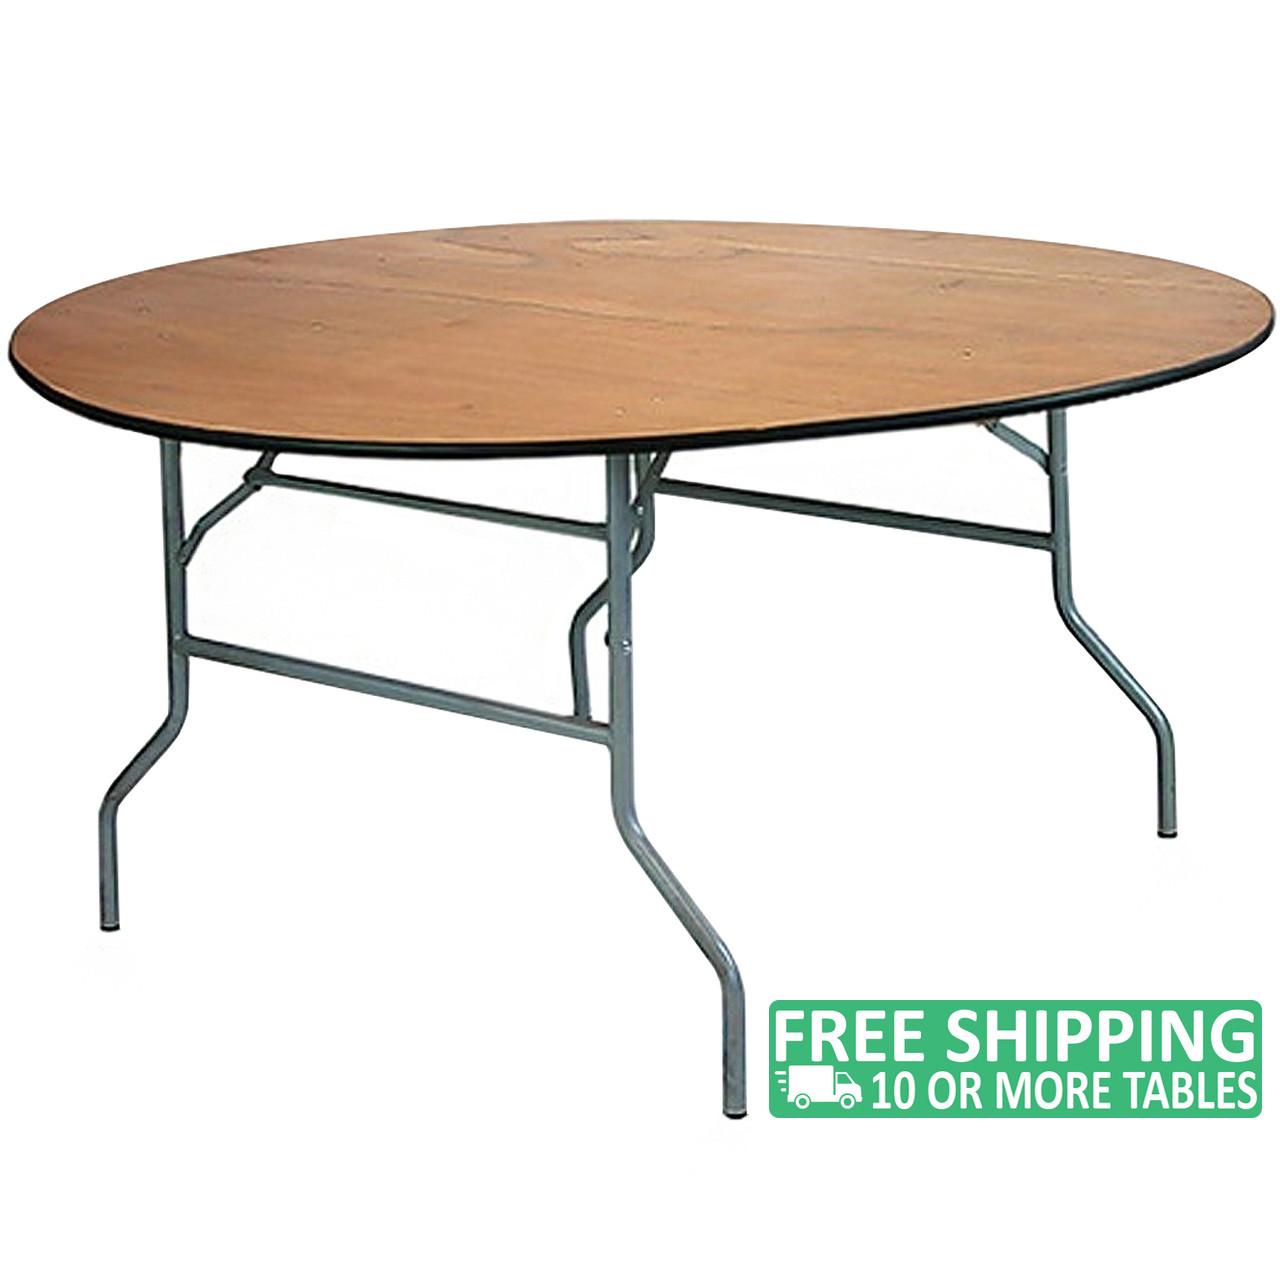 5 Ft Round Wood Folding Banquet Table [FTPW 60R] | AdvantageChurchChairs.com